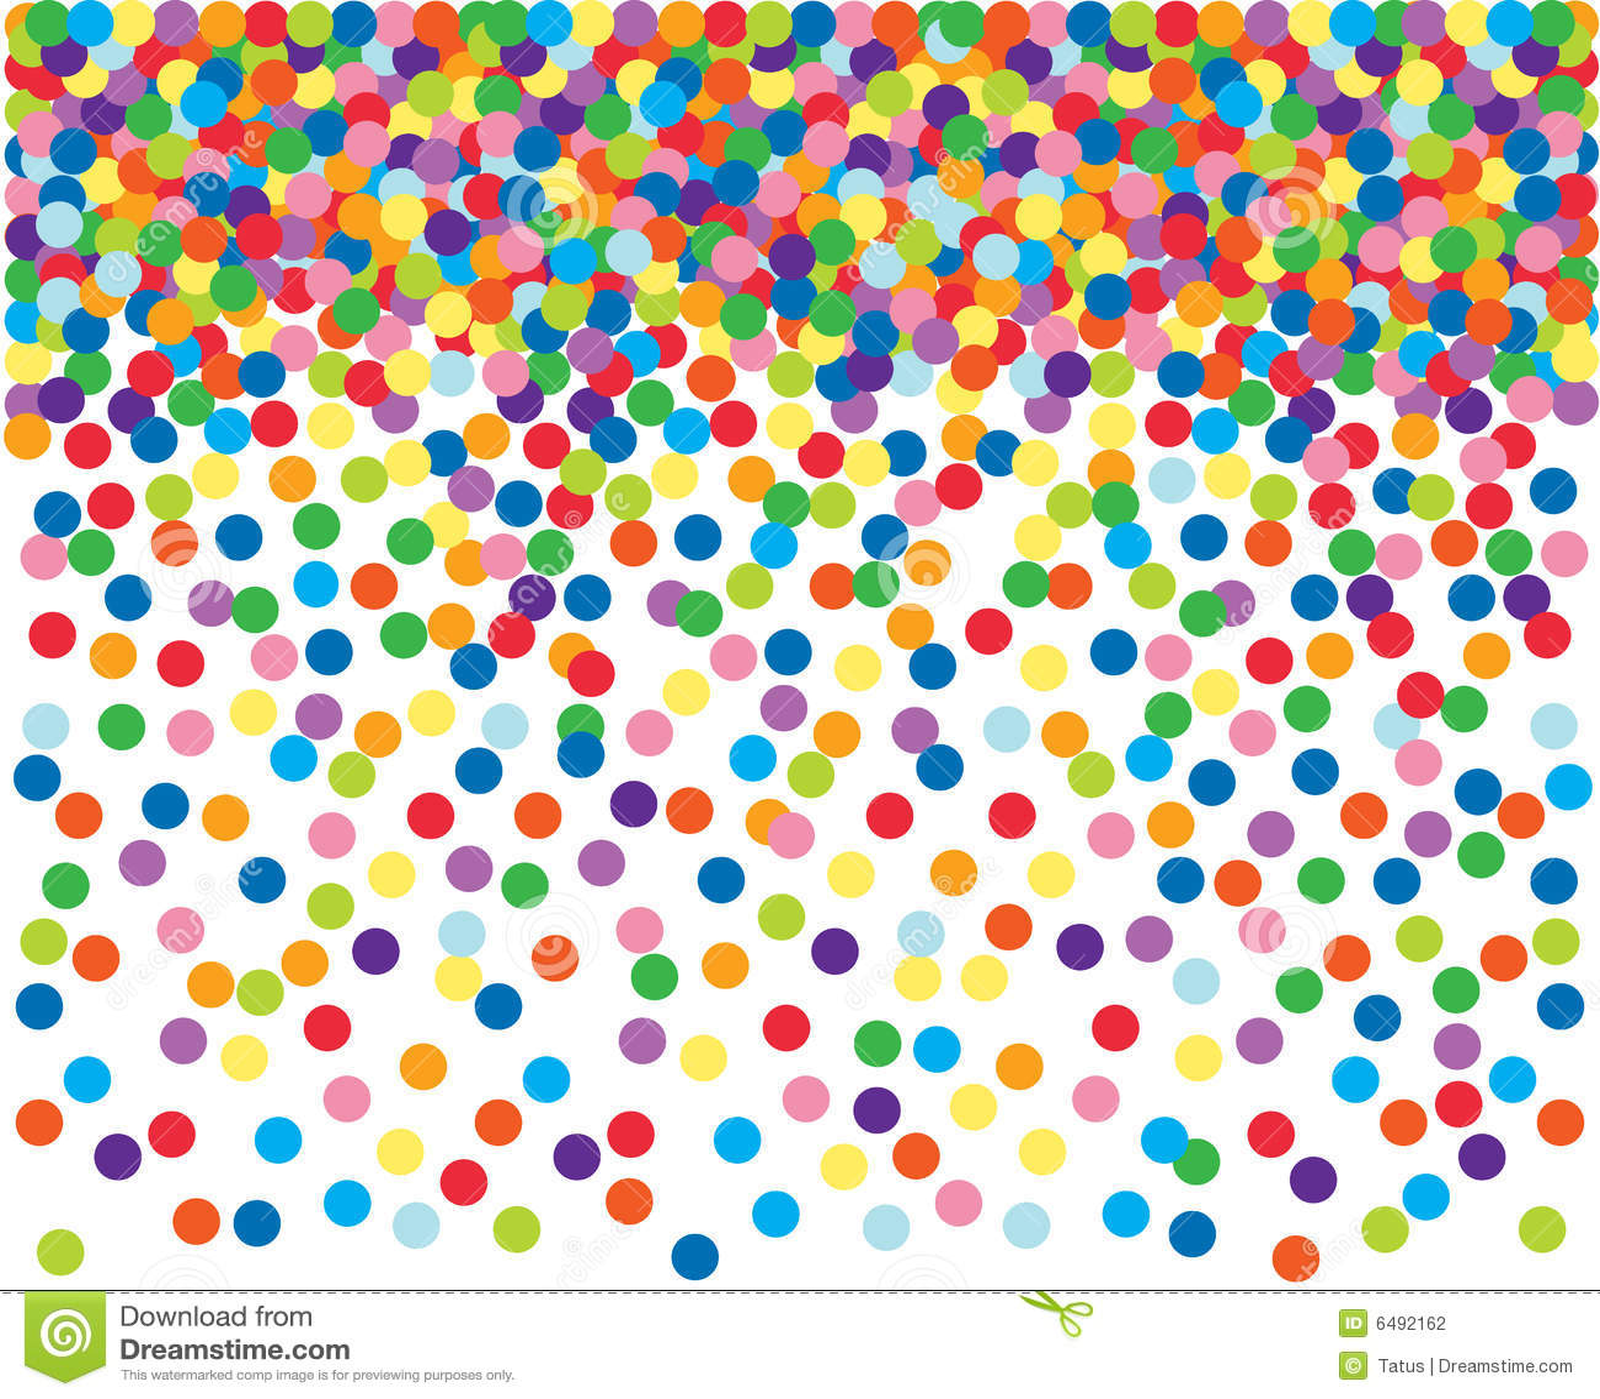 Kleurrijke confettienachtergrond.